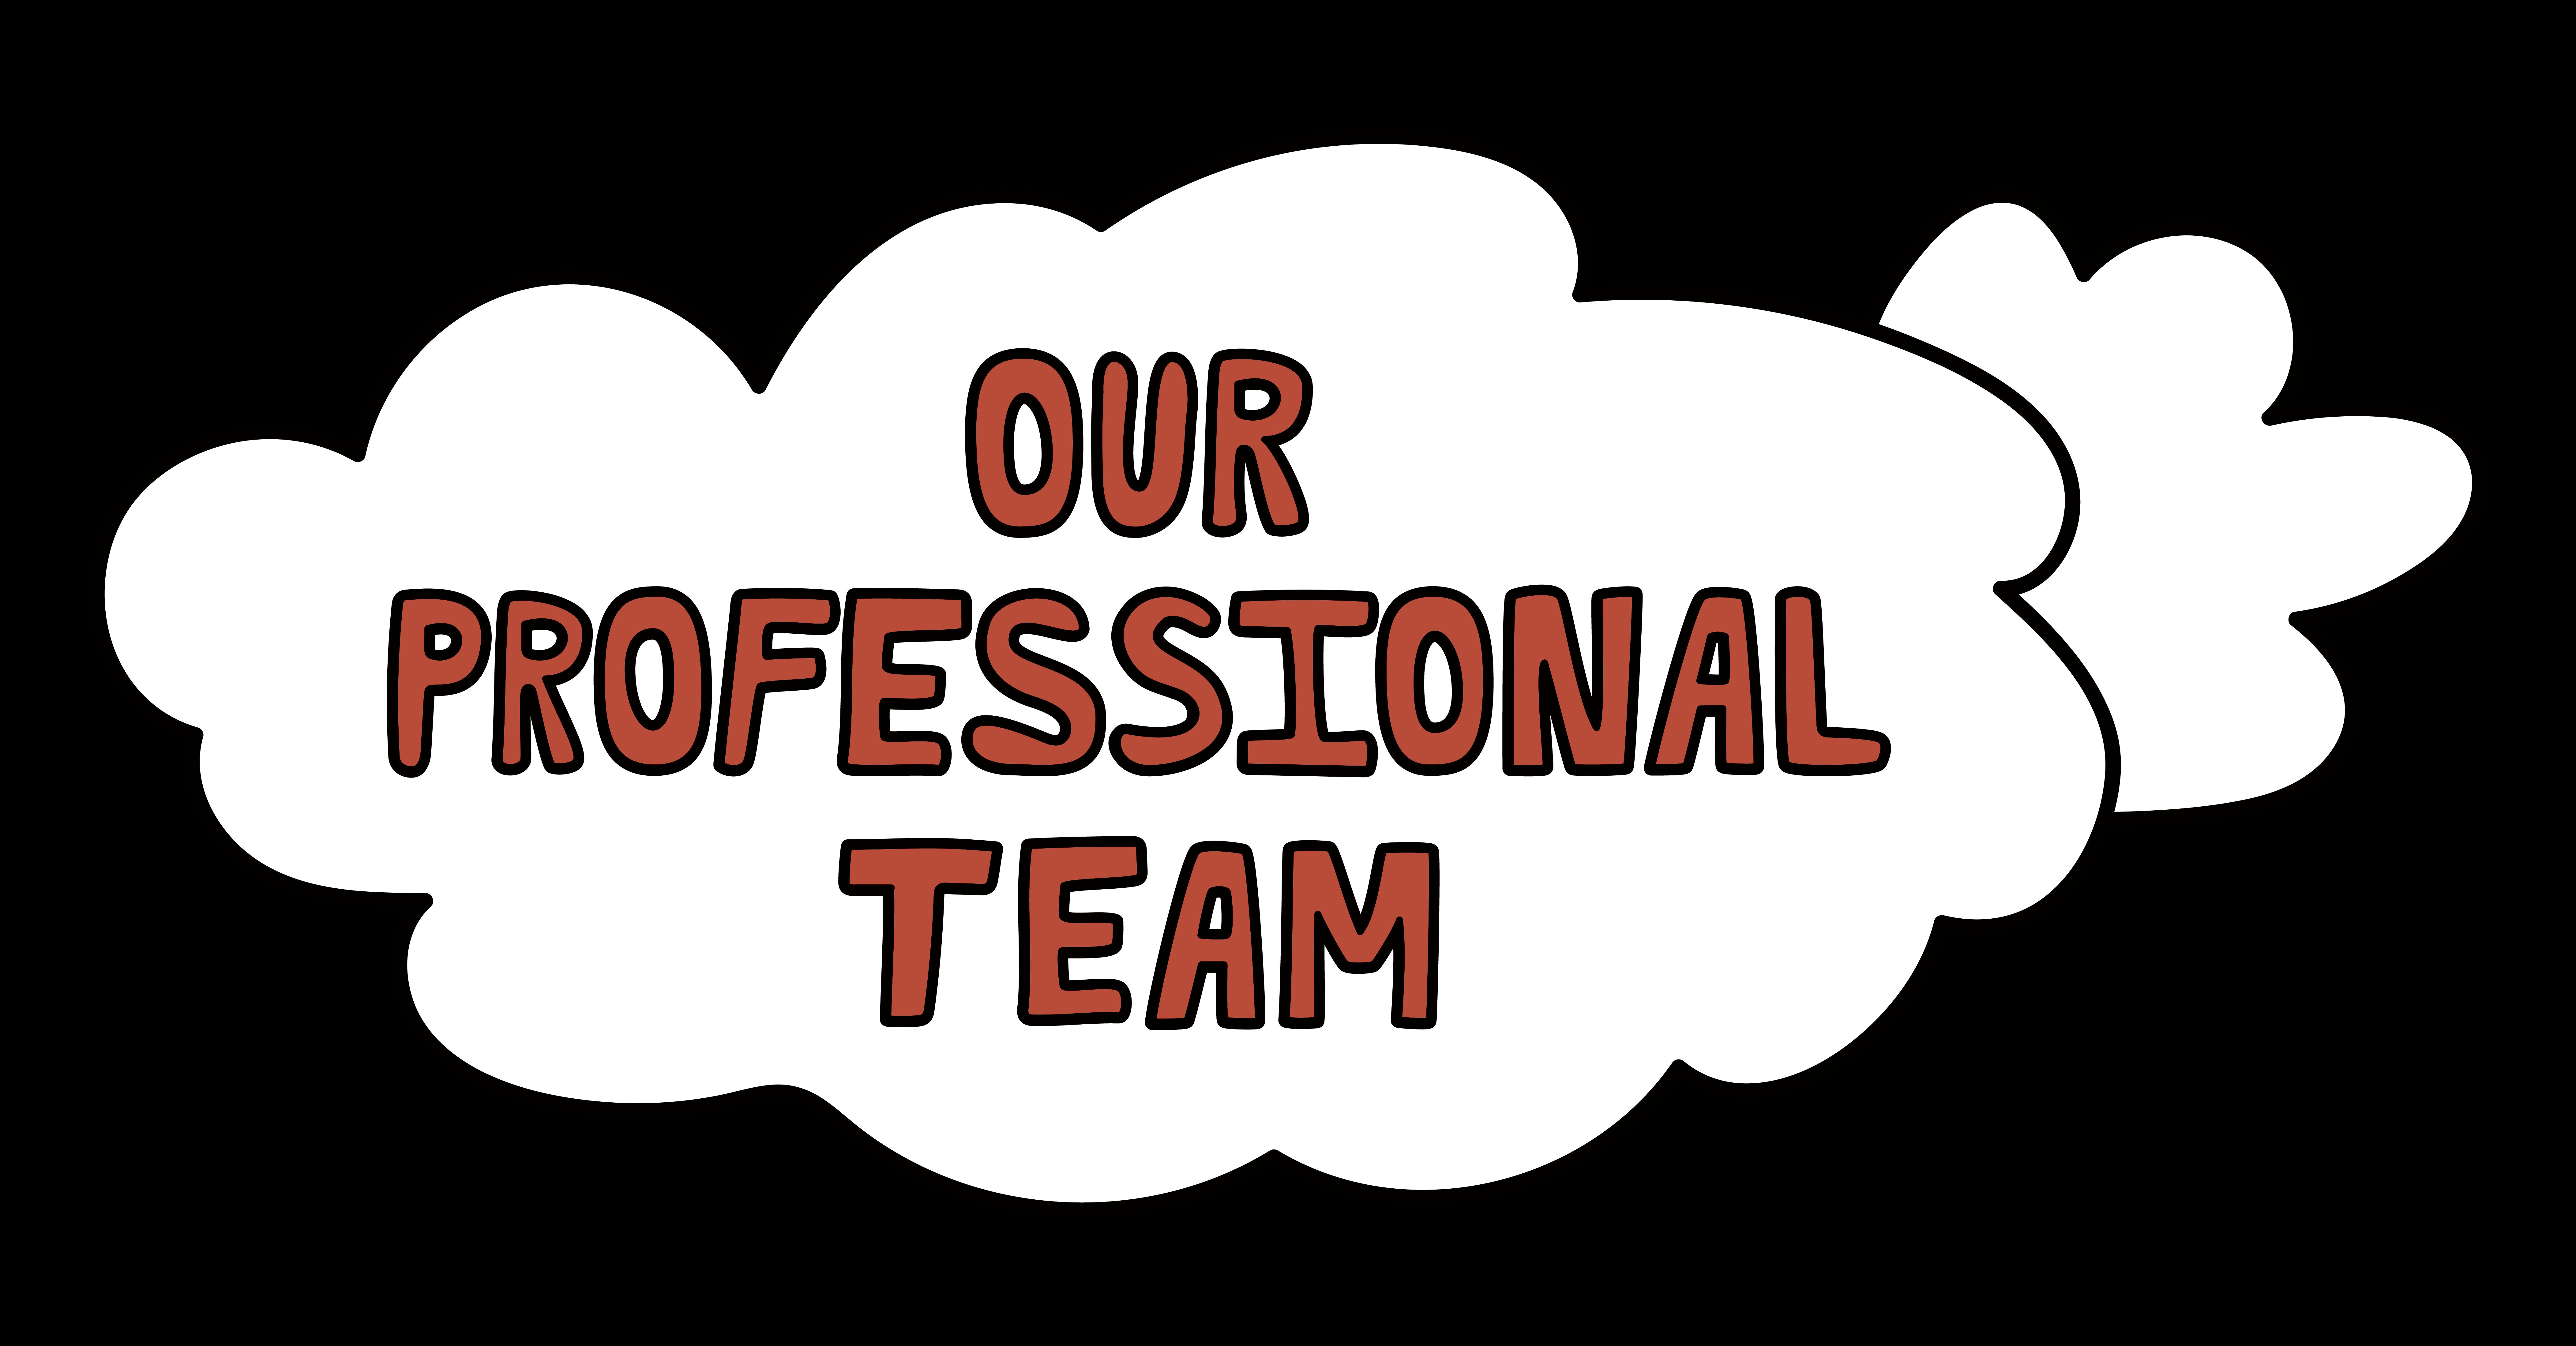 Our Professionals Team